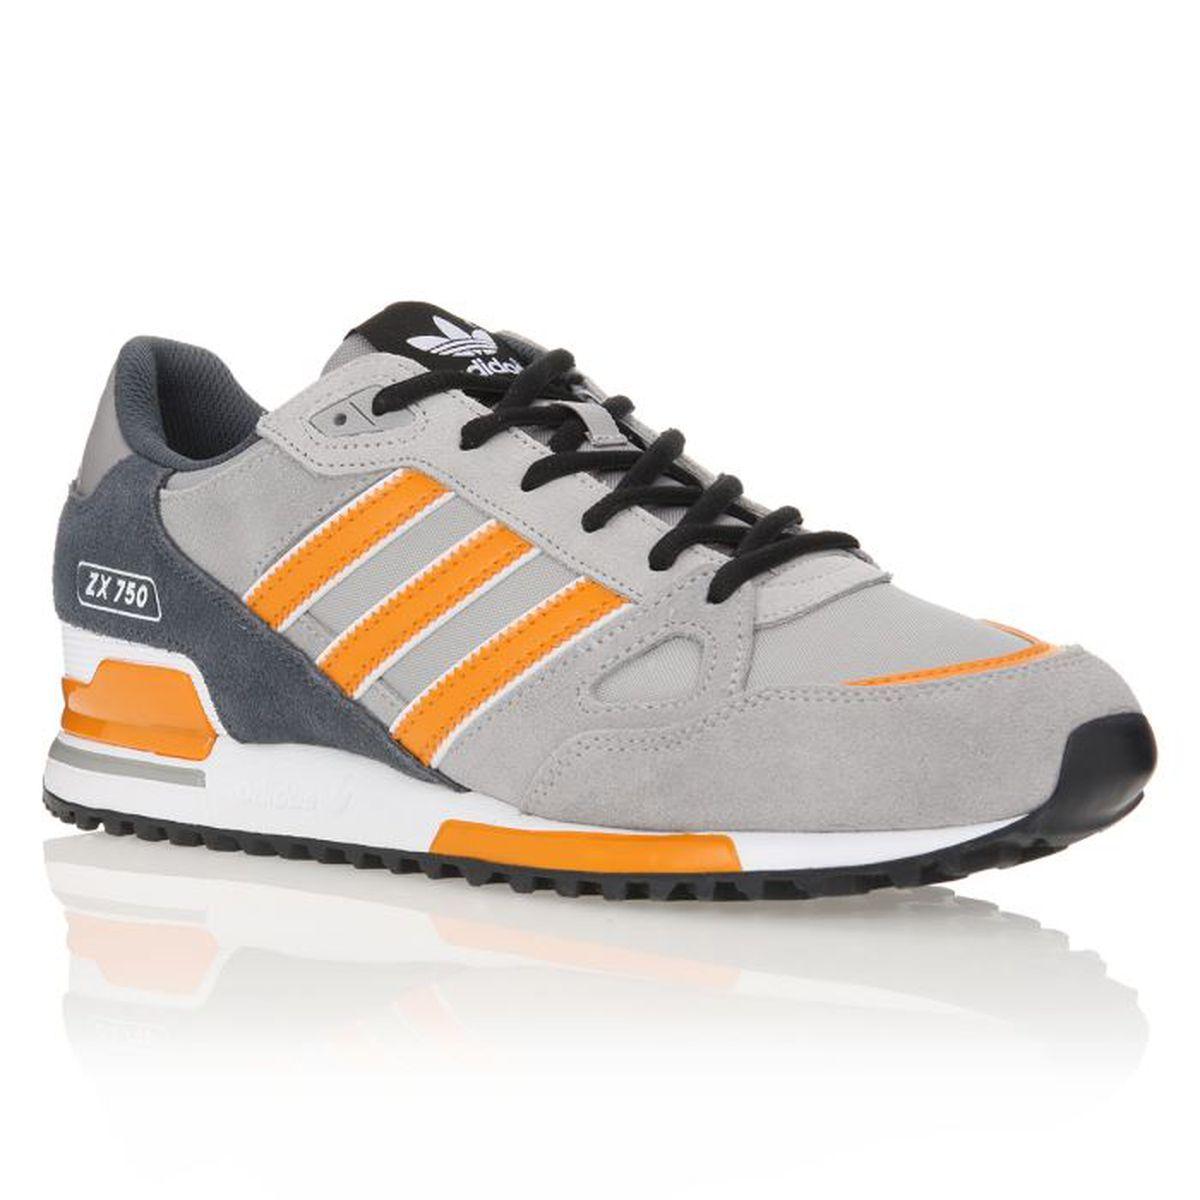 adidas baskets cuir zx750 homme